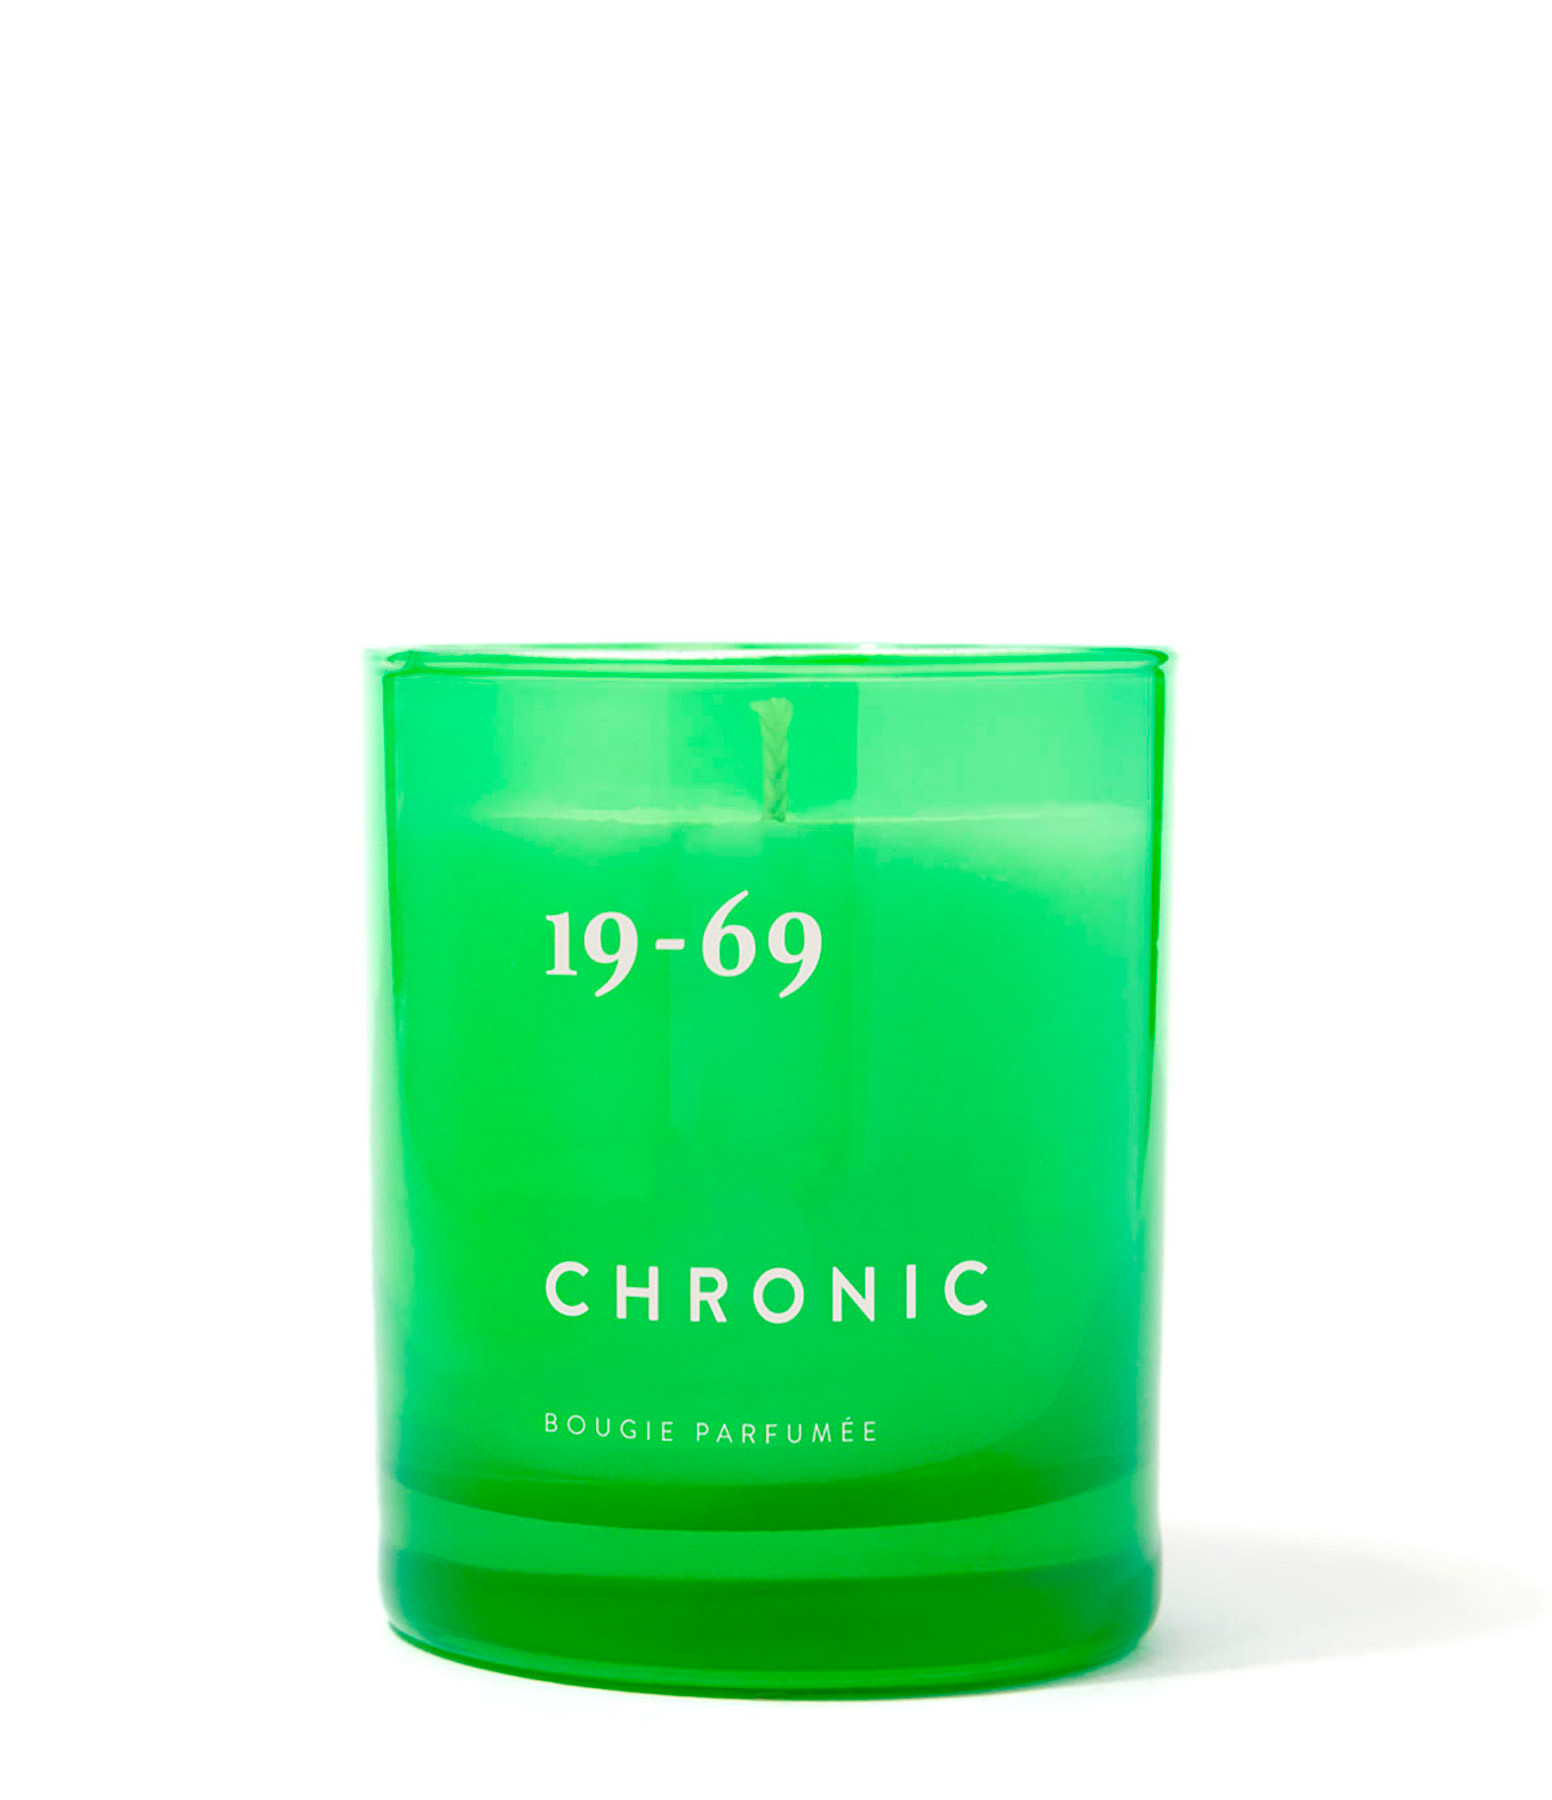 19-69 - Bougie Chronic 200 ml